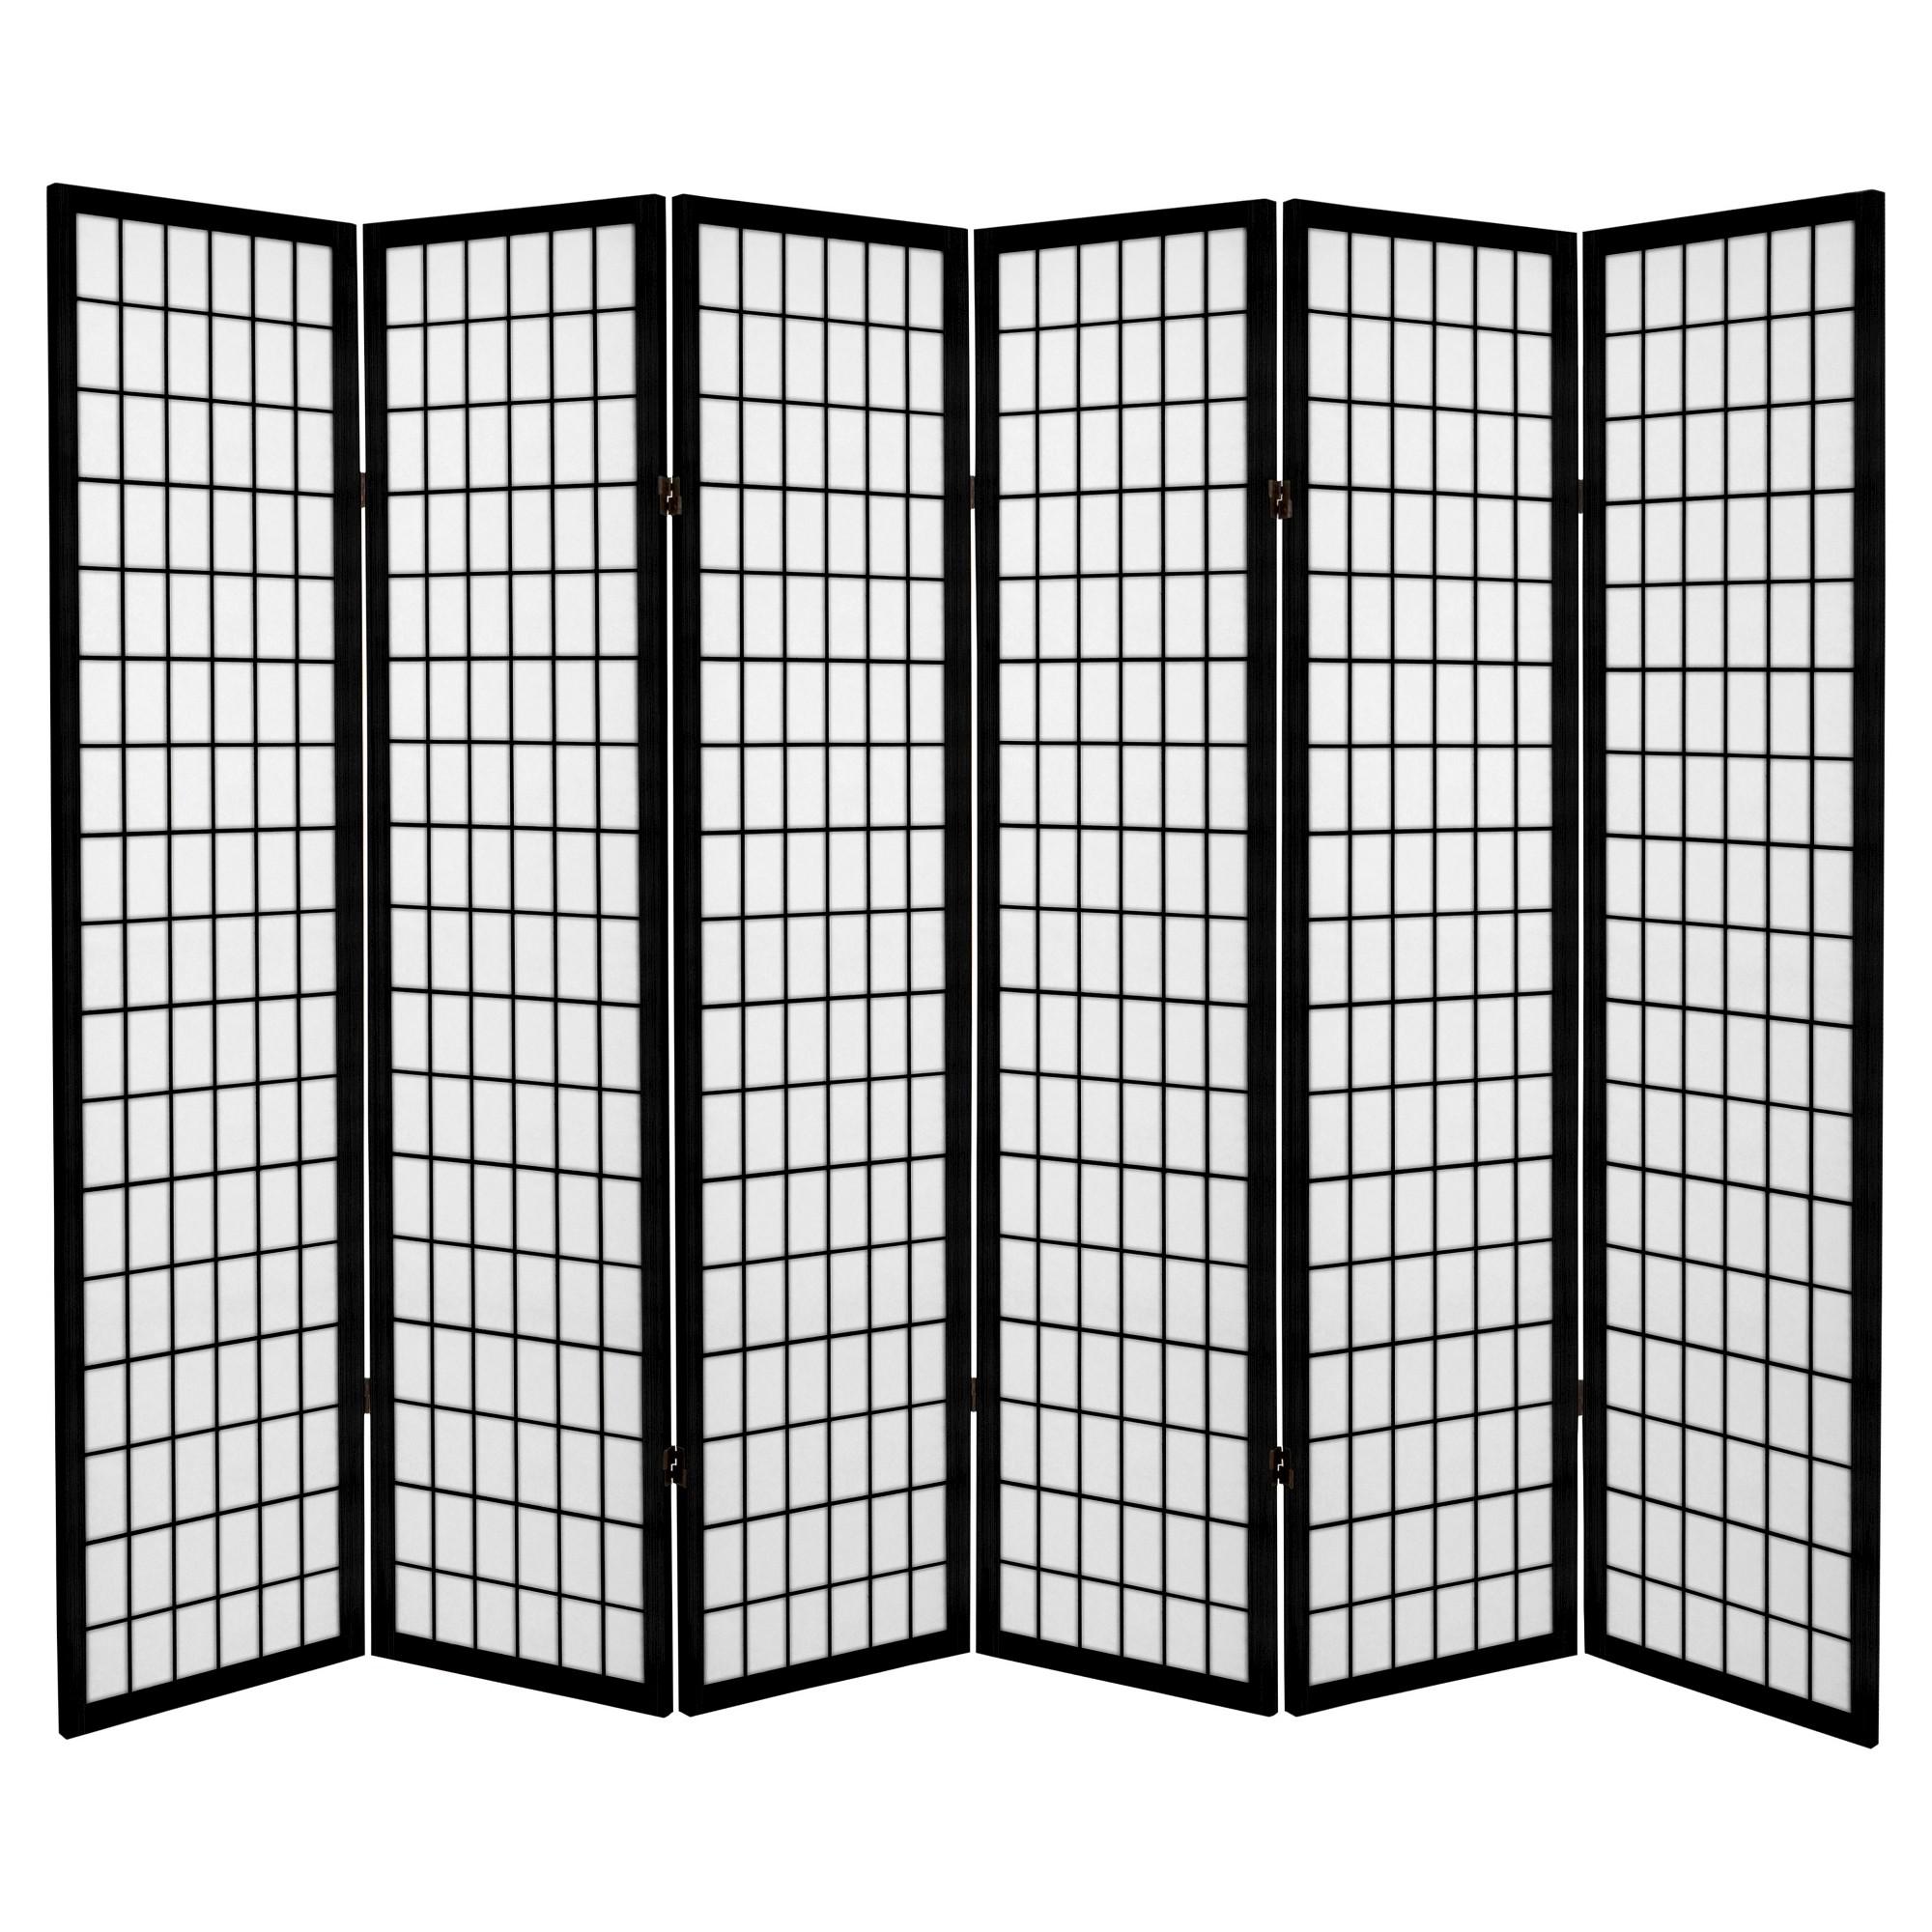 Wohndesign jali  ft tall canvas window pane room divider  black  panels